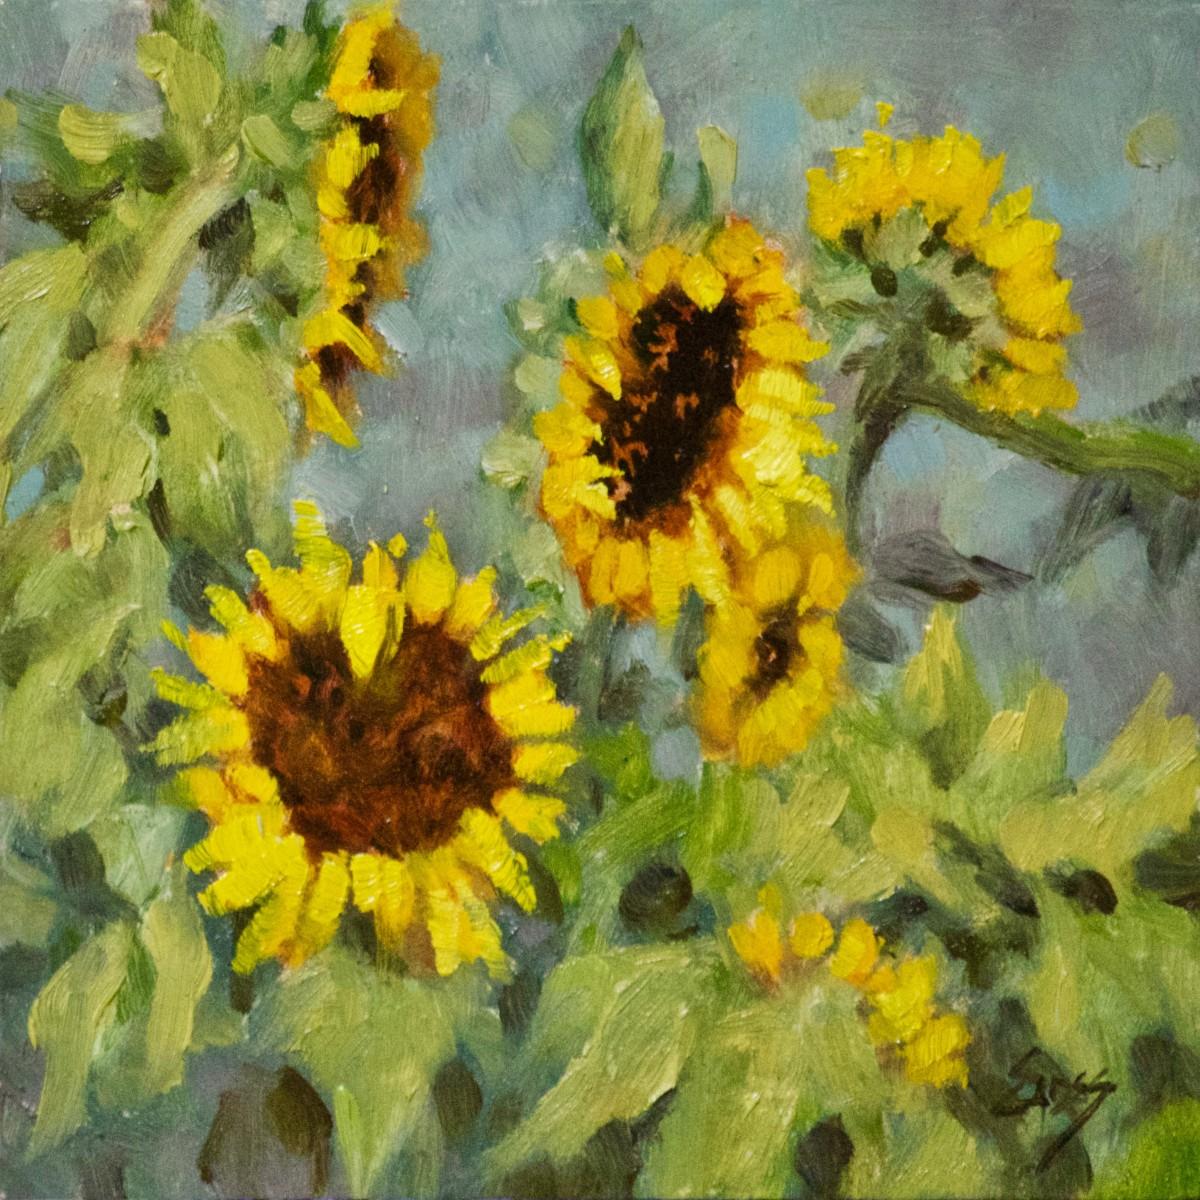 Sunflower Sighting by Linda Eades Blackburn